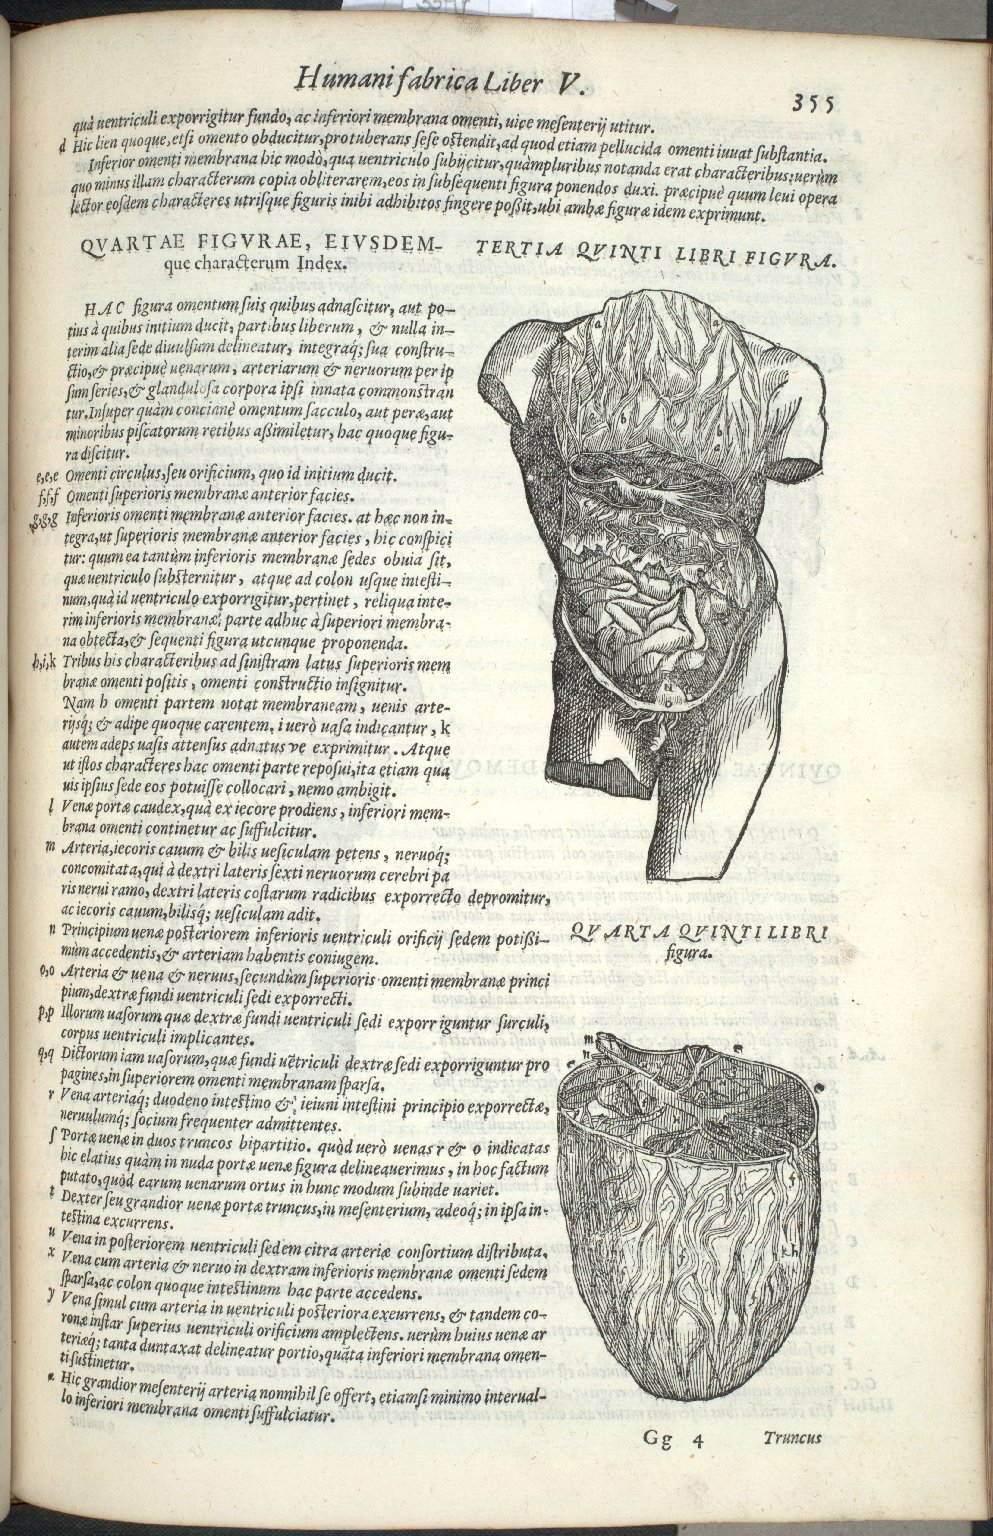 Tertia Quinti Libri Figura, Quart Quinti Libri Figura